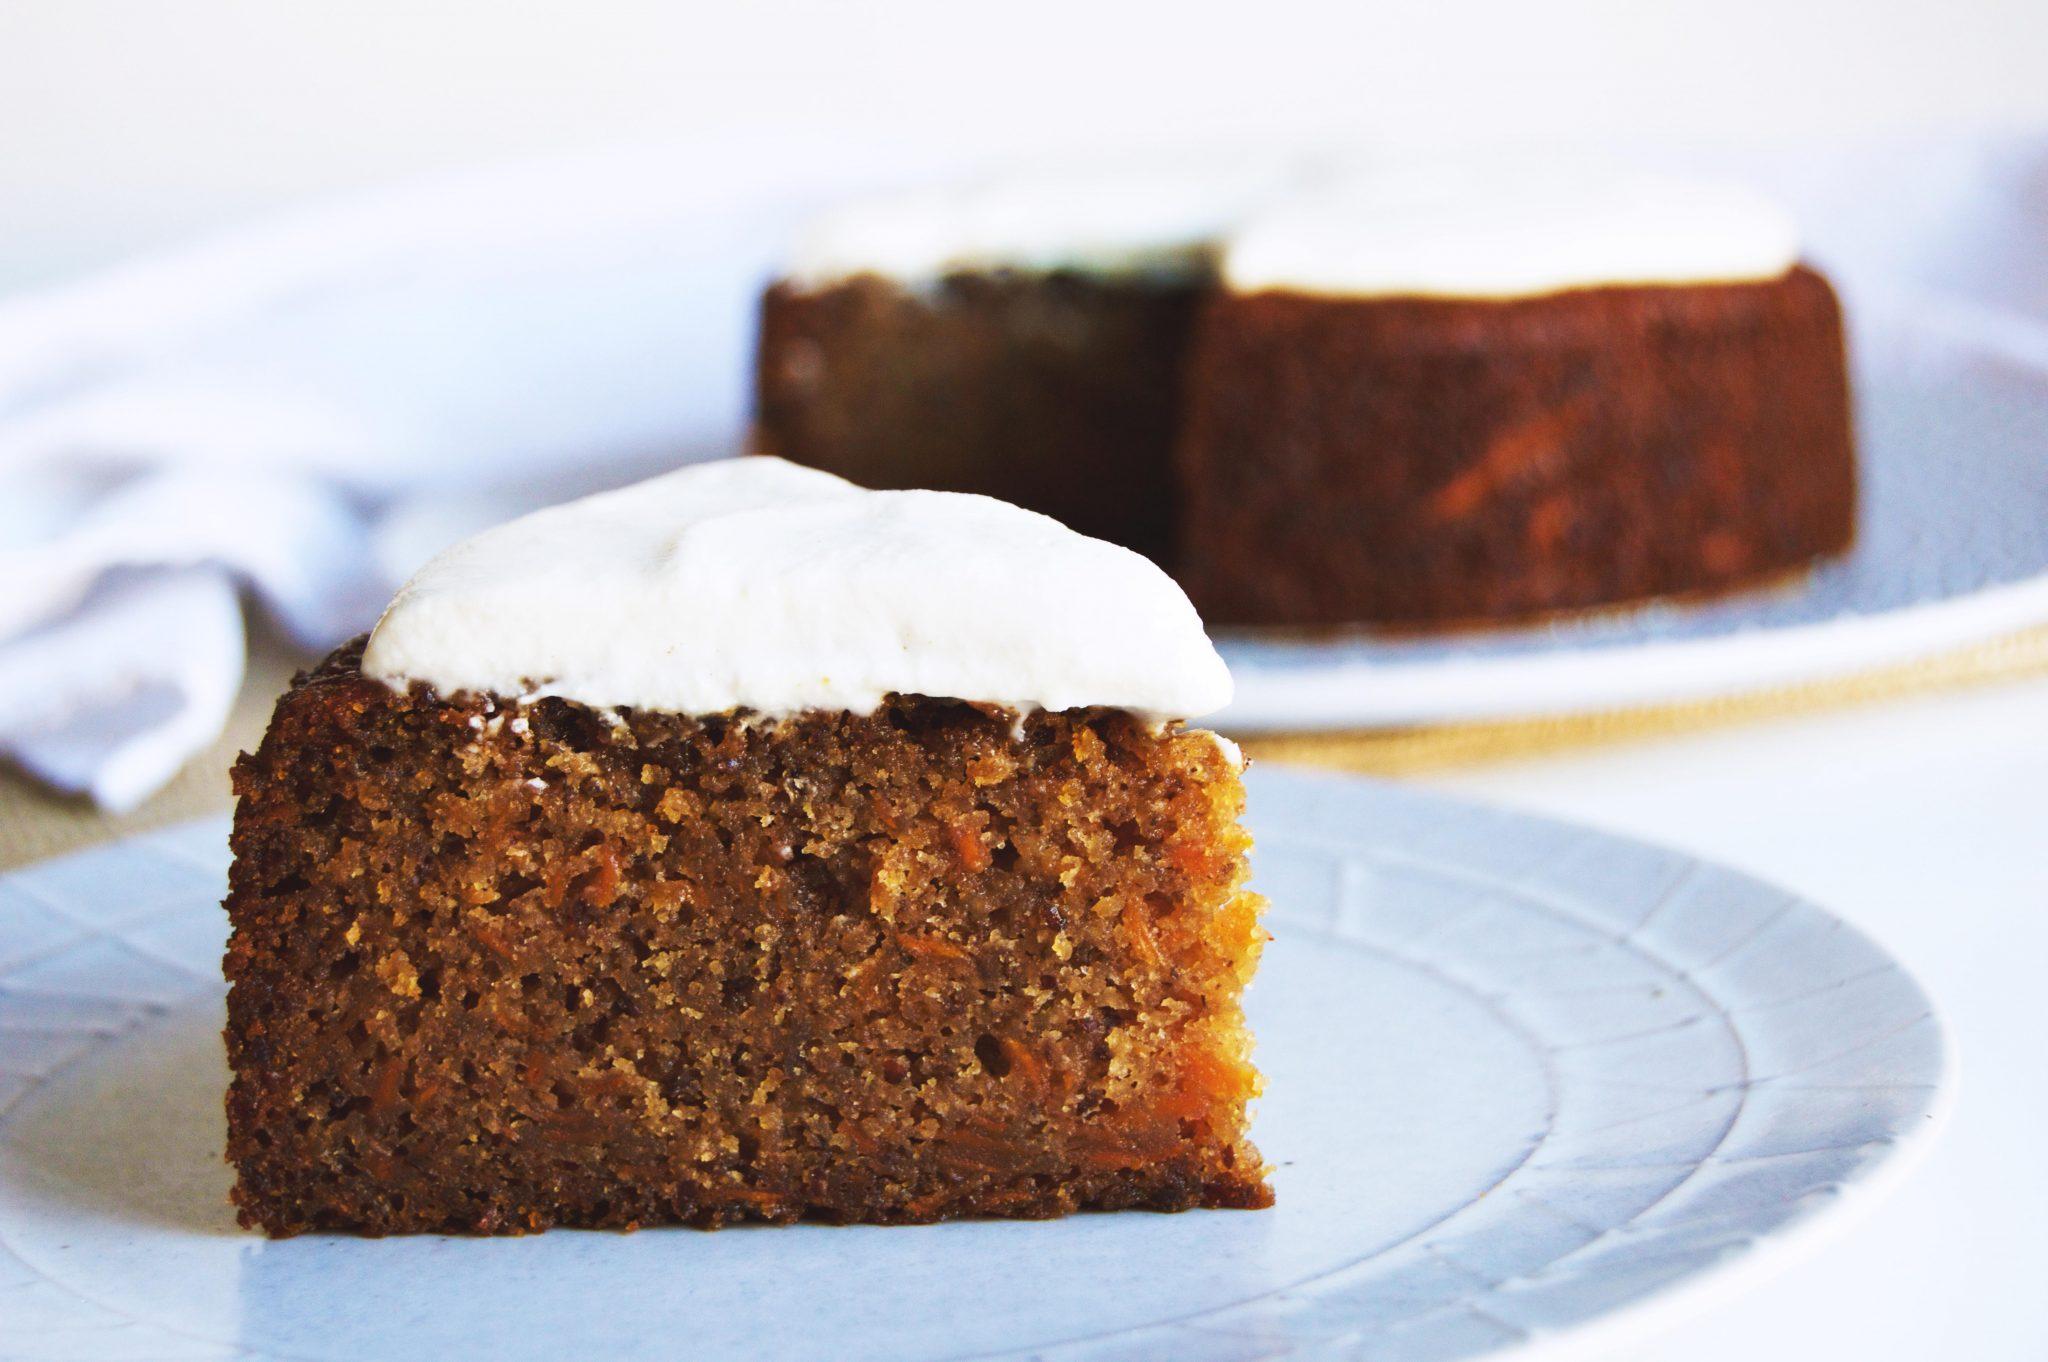 vegan spiced carrot cake gluten free cakes cupcakes dessert summer